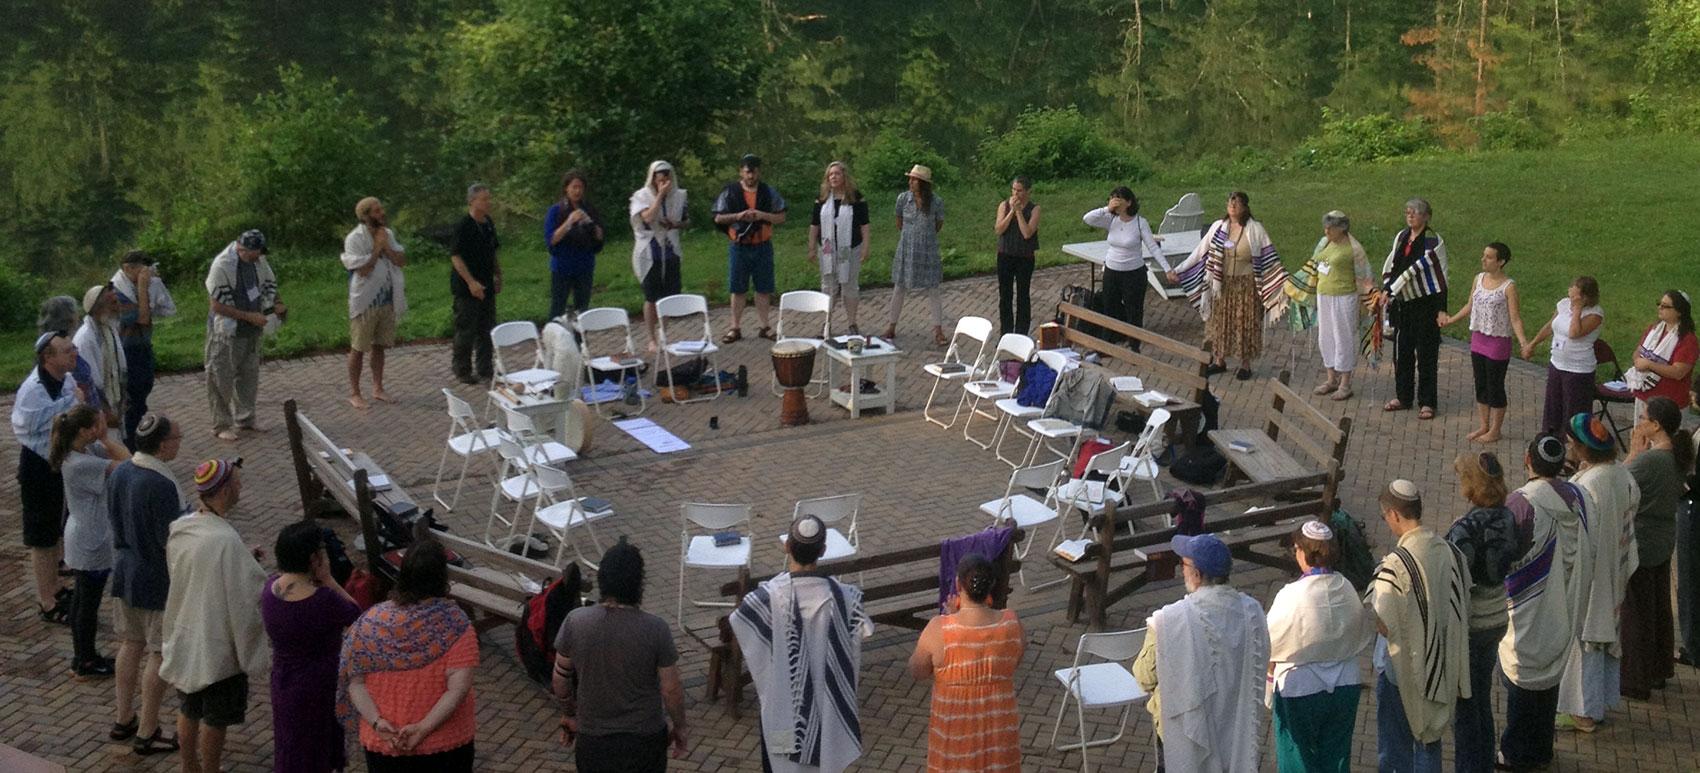 Co-leading prayer at Isabella Freedman Jewish Retreat Center